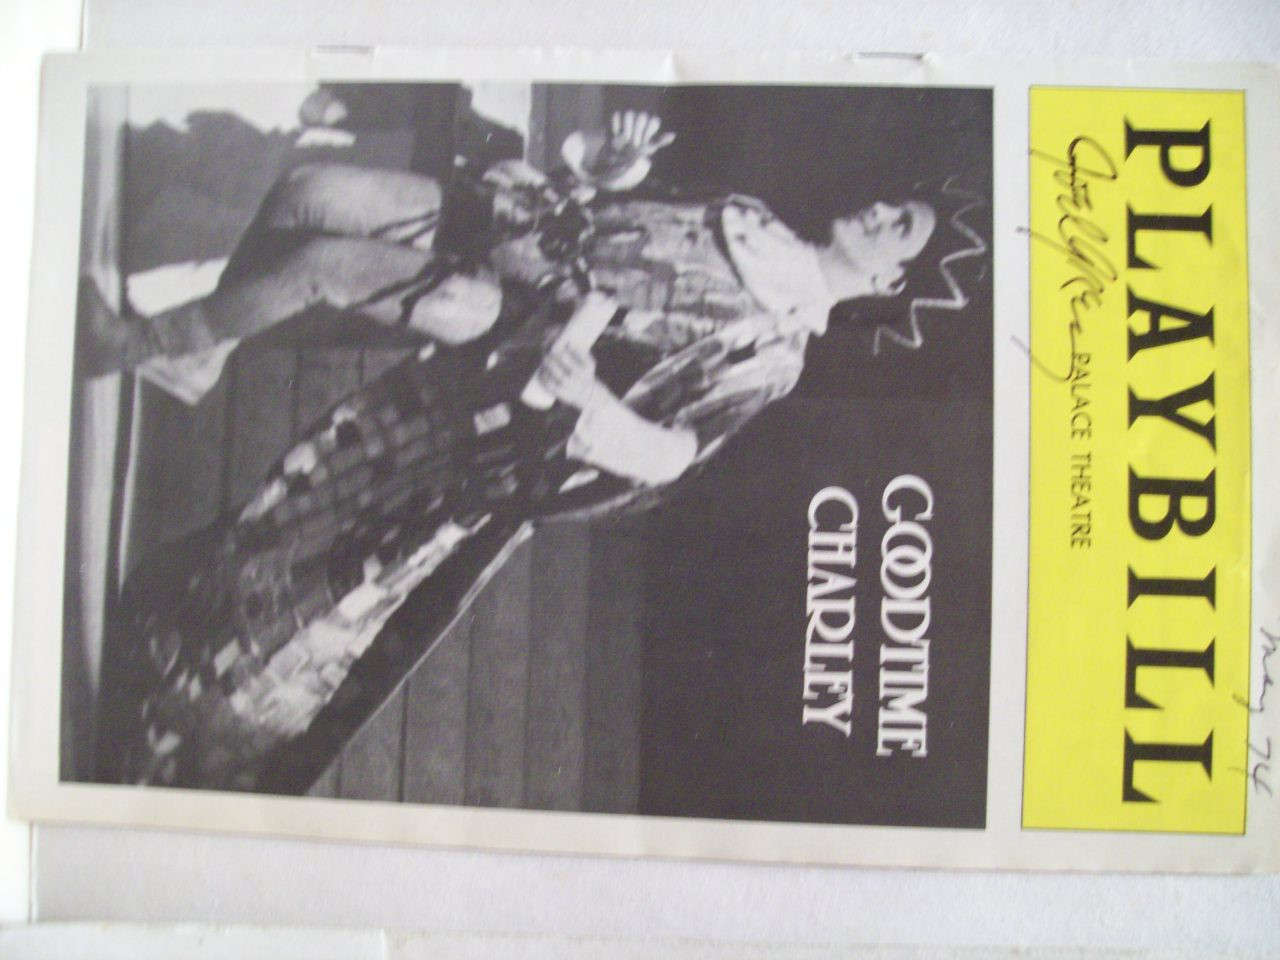 Grey, Joel Playbill Signed Autograph Goodtime Charley 1974